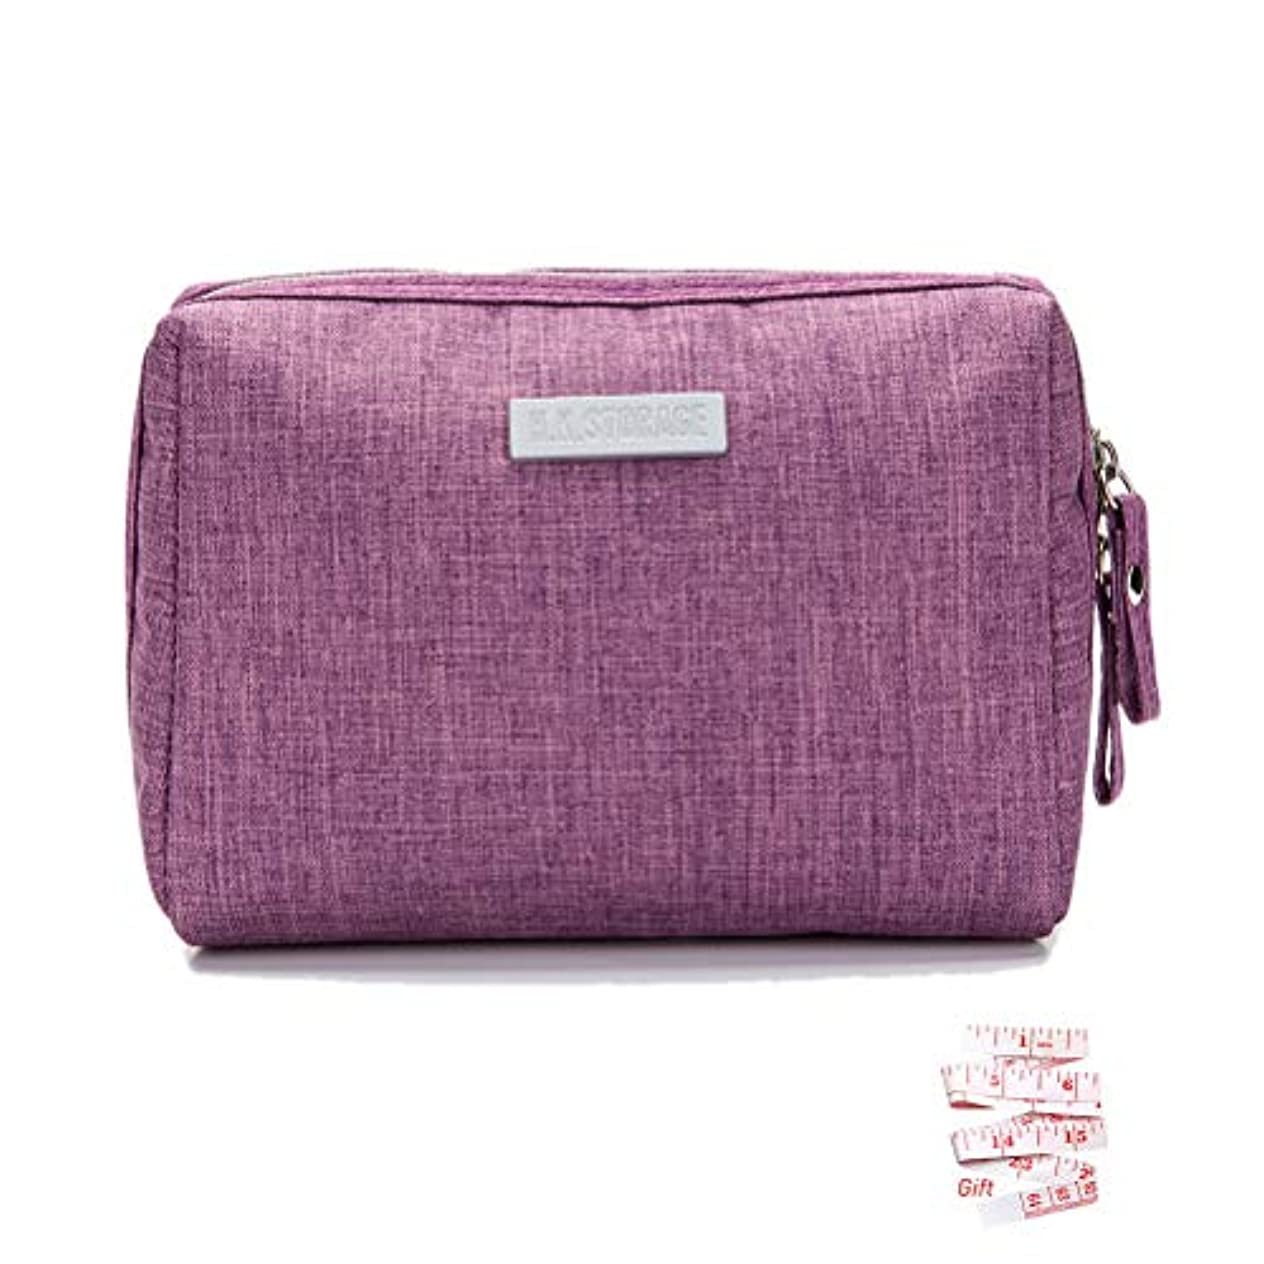 欲望違う疎外Kaitein 化粧ポーチ 大容量 超軽量 防水 化粧品収納ポーチ 旅行 出張 普段使い 化粧バッグ 紫